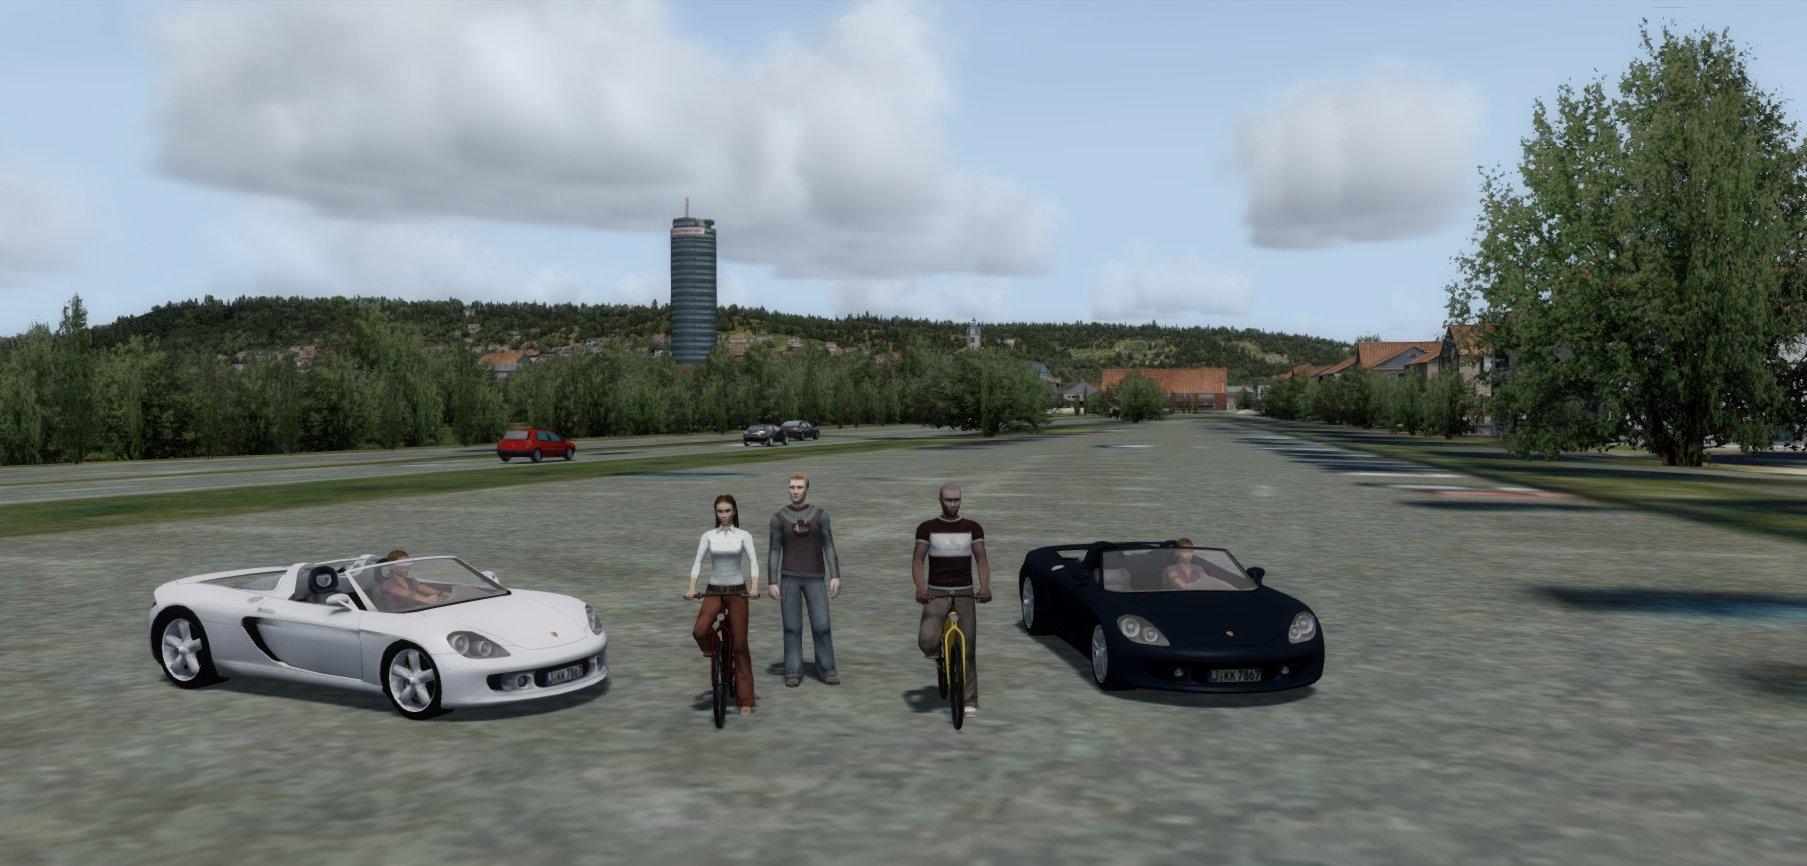 p3dv4_jena_vehicles_avatars.jpg